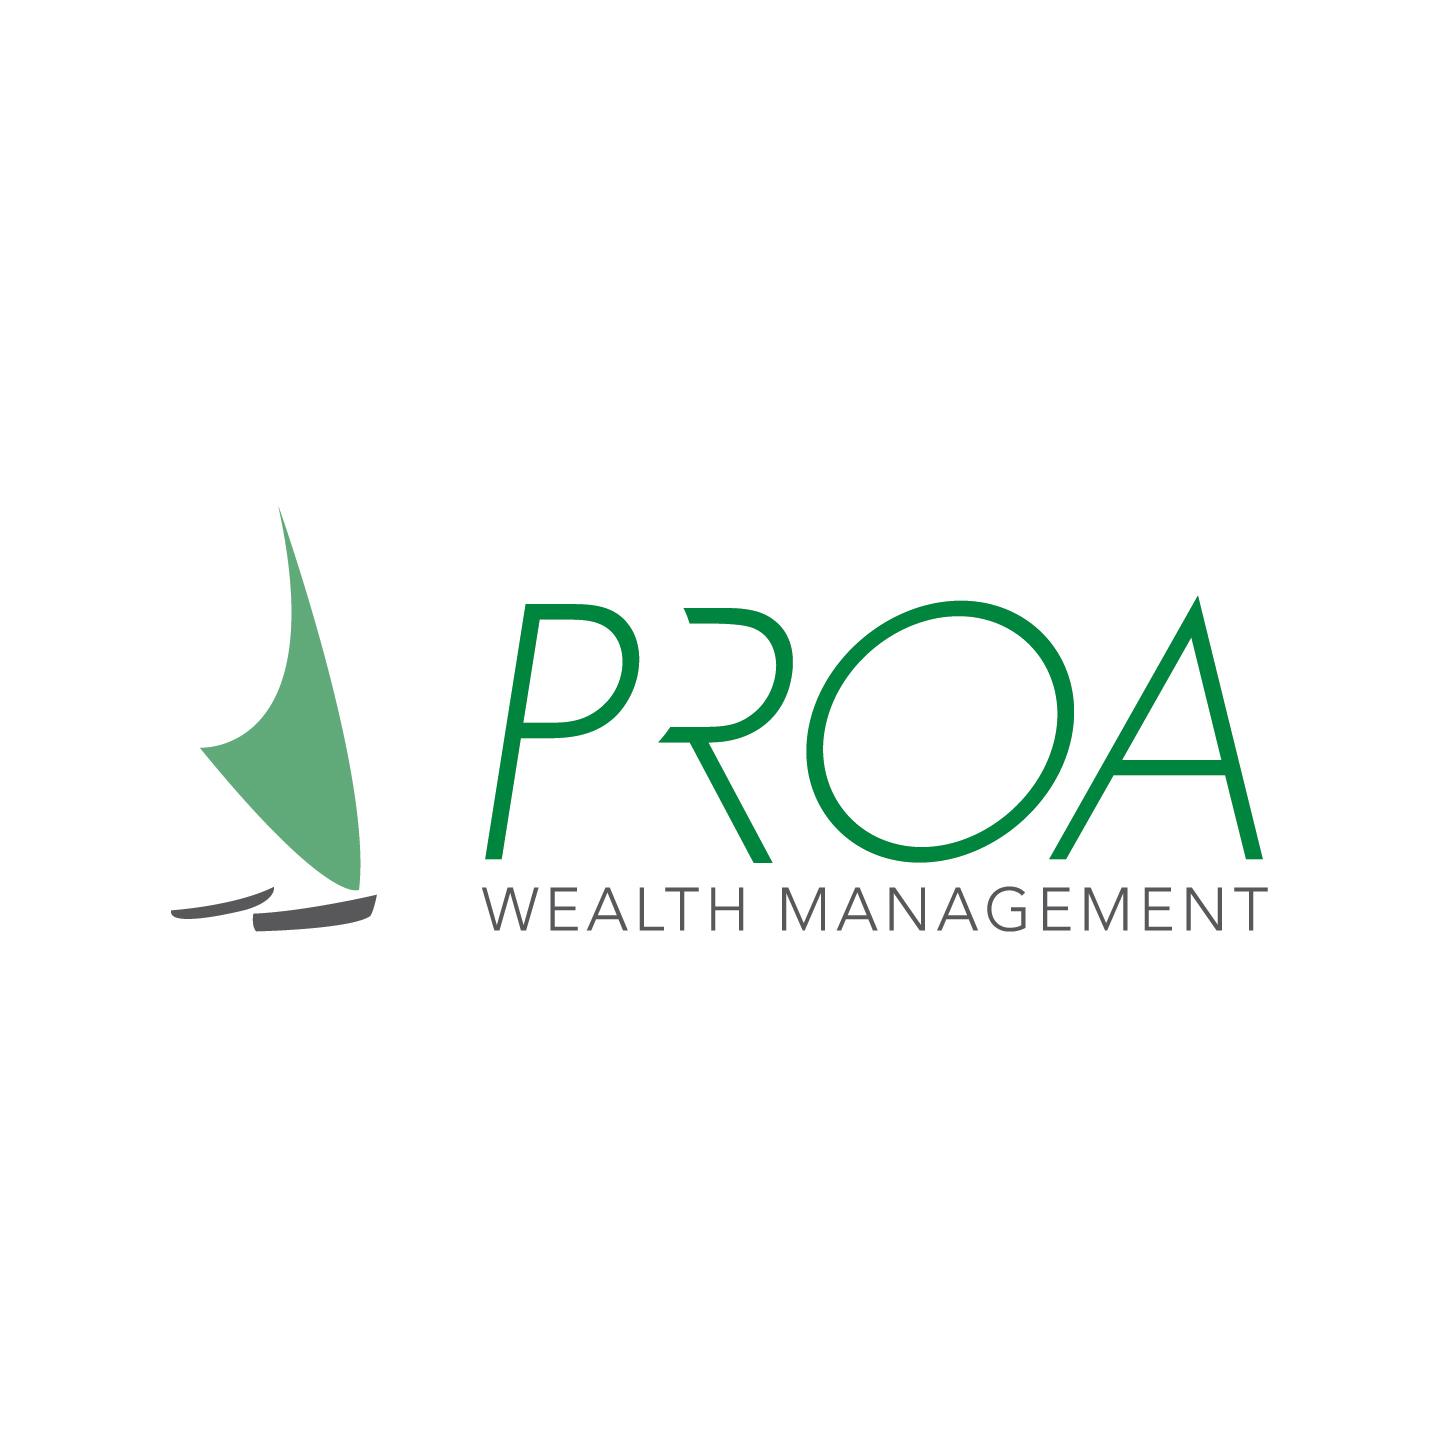 PROA Wealth Management